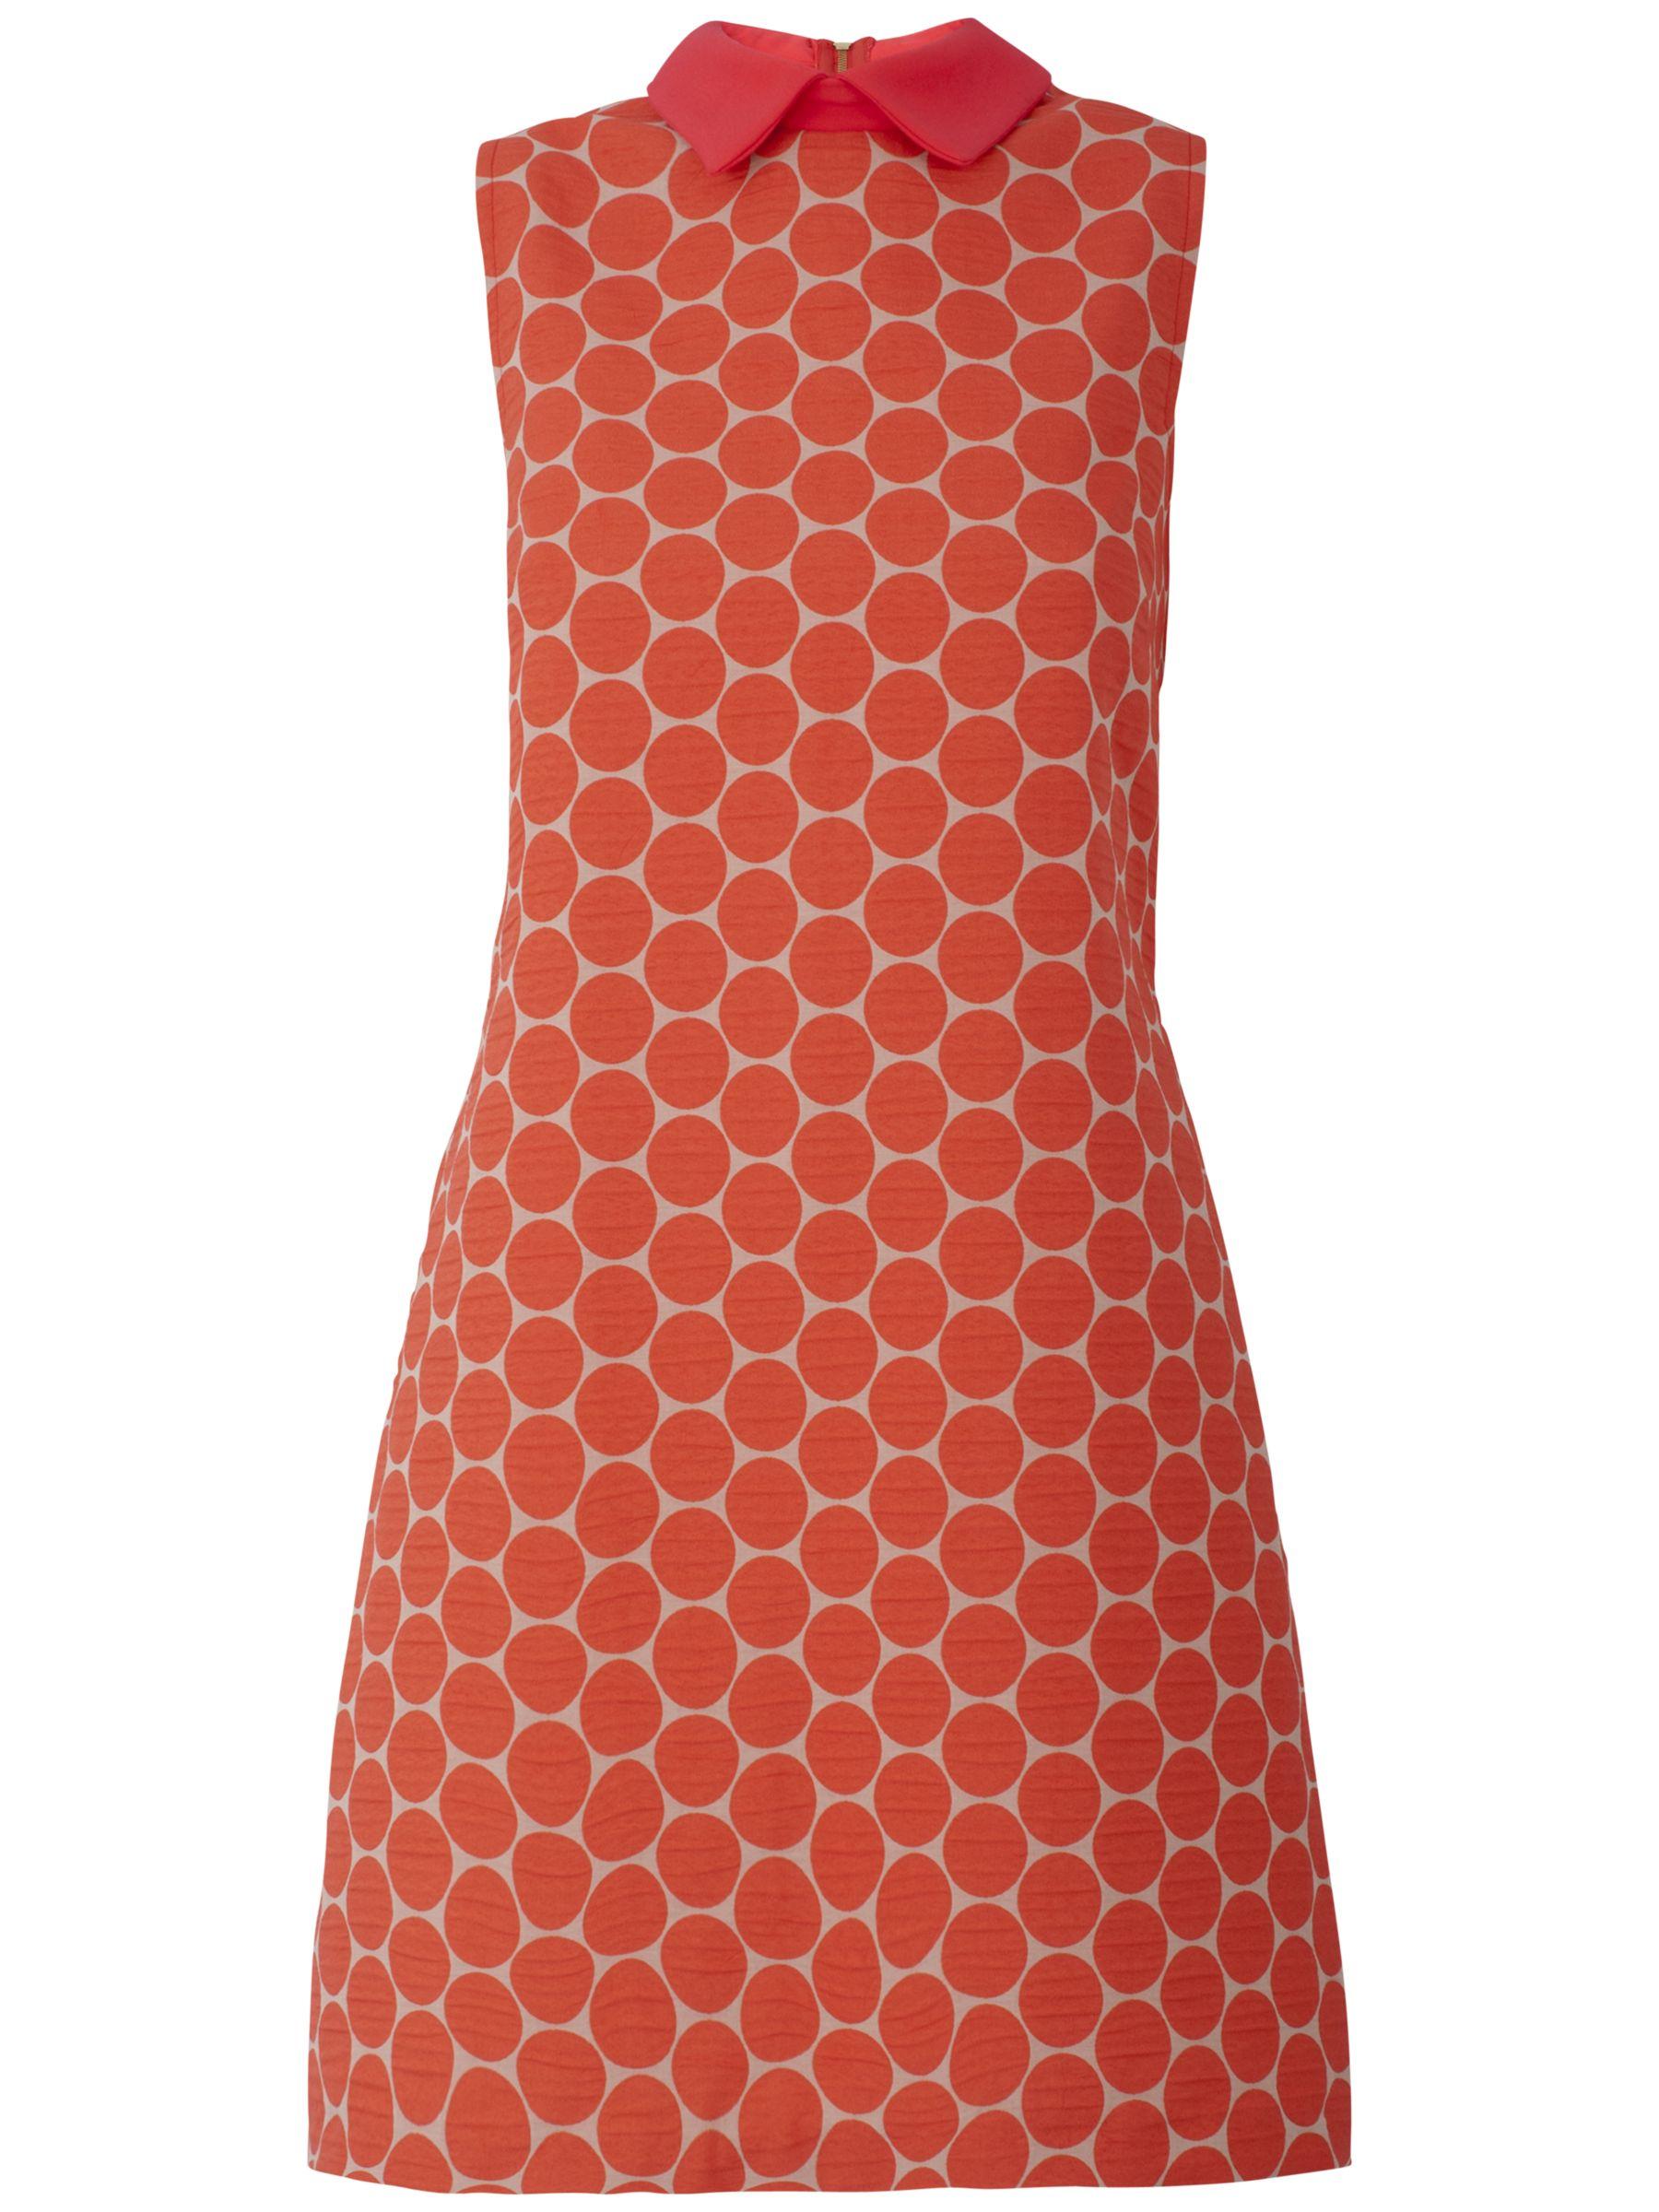 almari big spot collared dress coral, almari, big, spot, collared, dress, coral, 14|12|8|10, women, womens dresses, 1125125